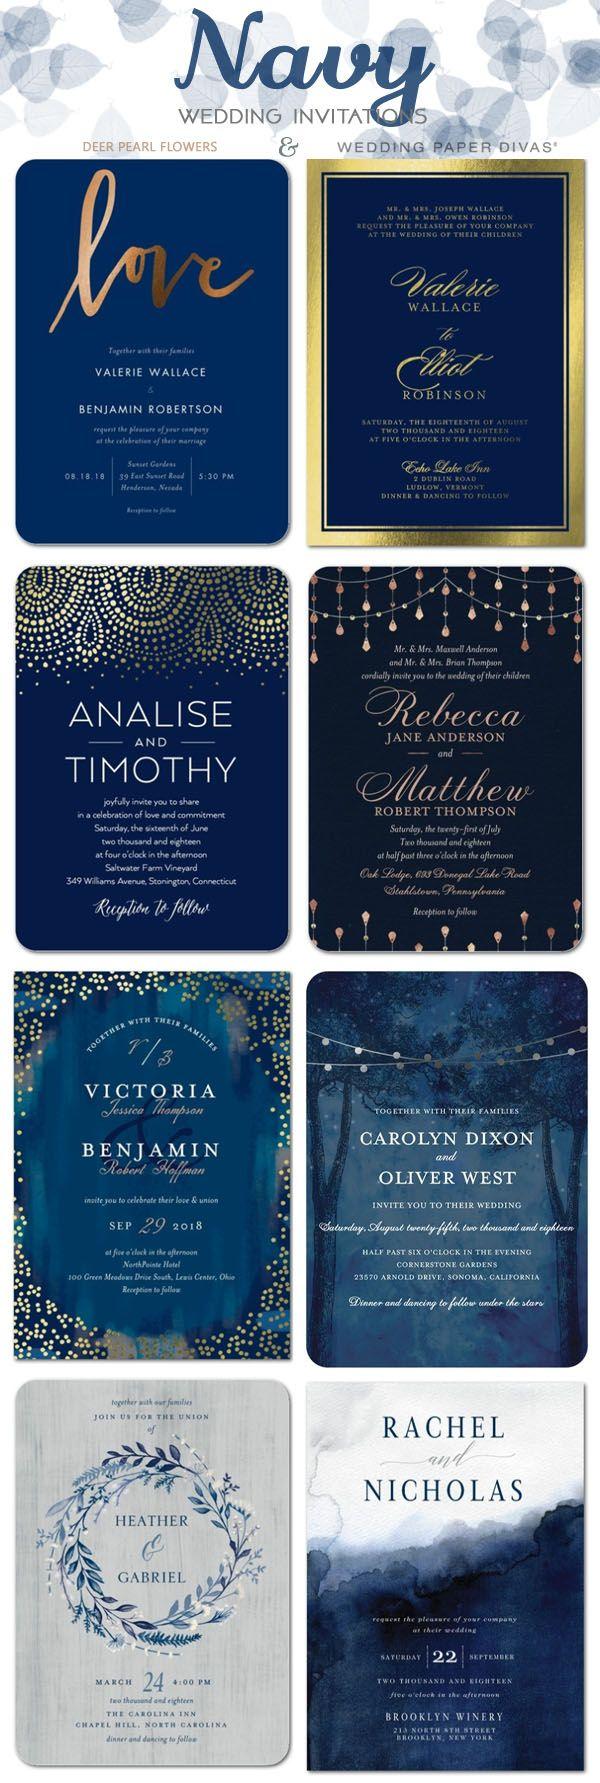 Navy blue wedding color ideas - navy blue wedding invitations / http://www.deerpearlflowers.com/wedding-paper-divas-wedding-invitations/2/